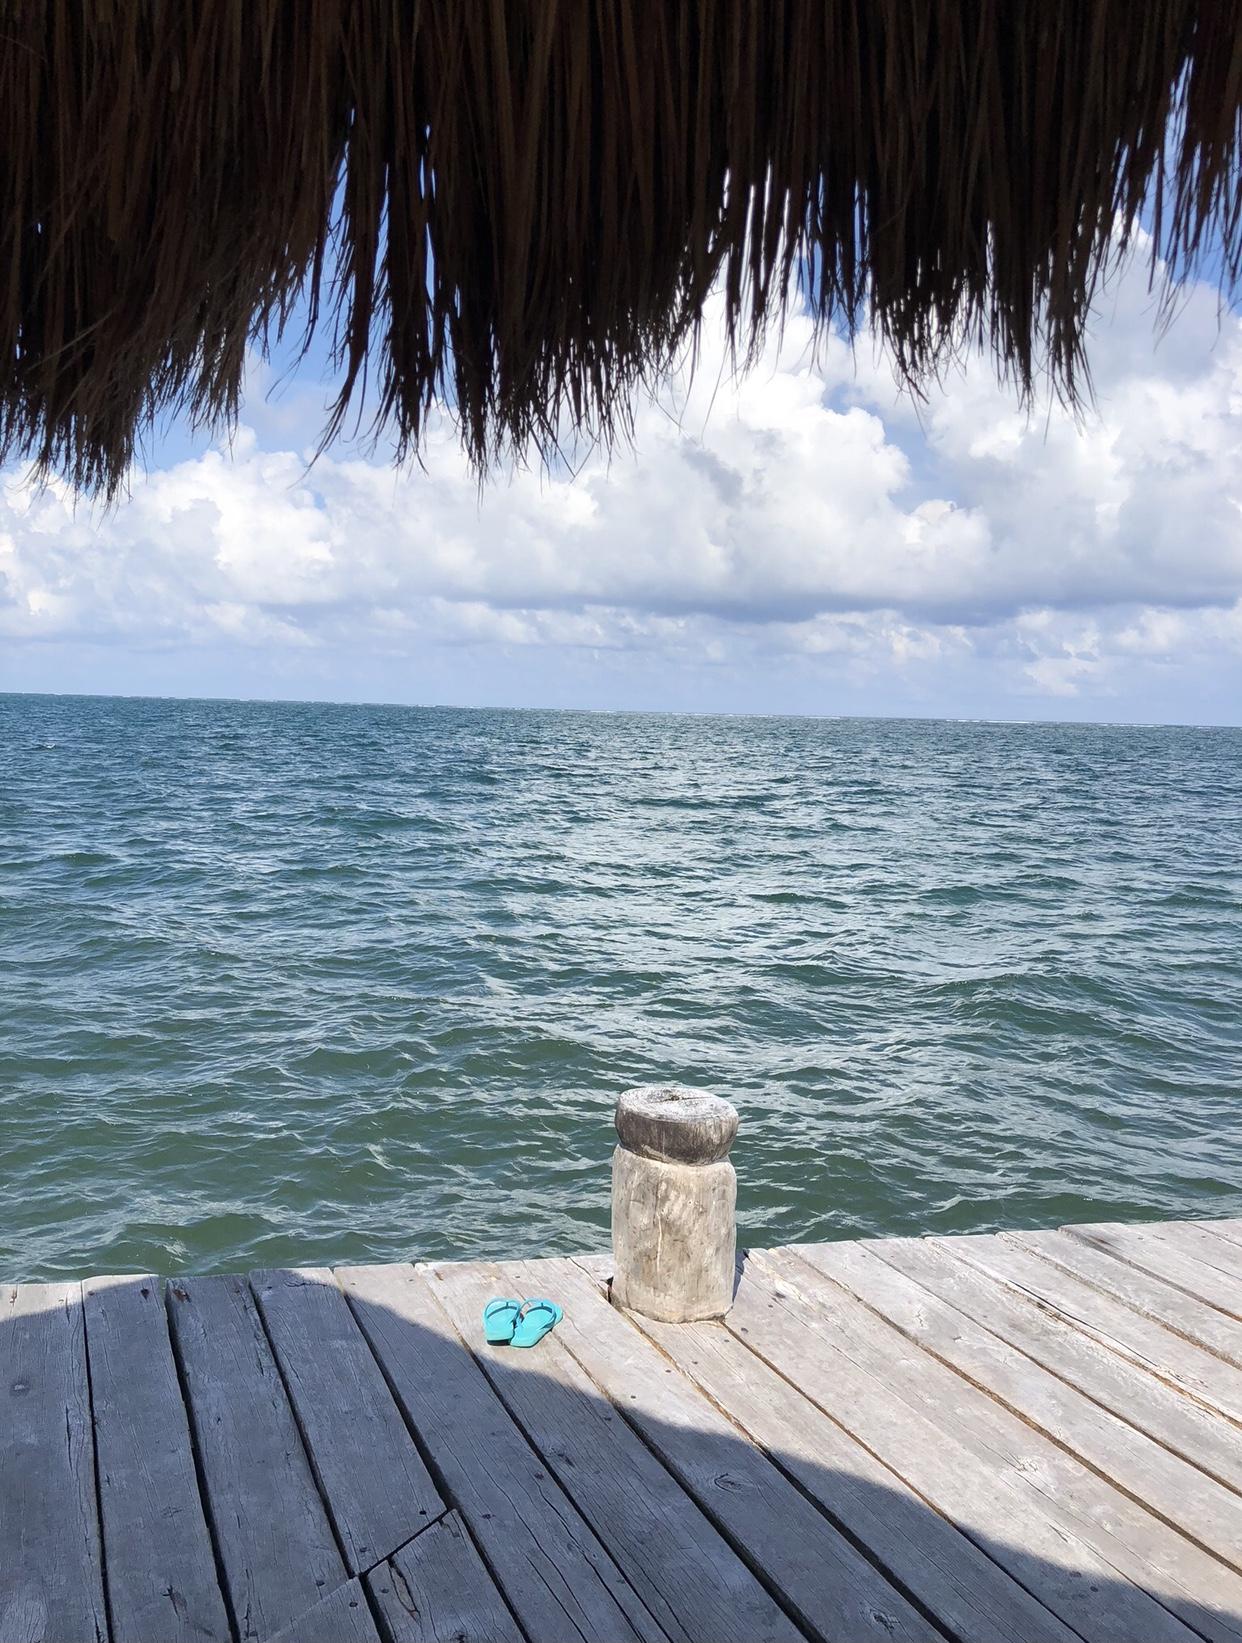 the dock at desire riviera maya resort